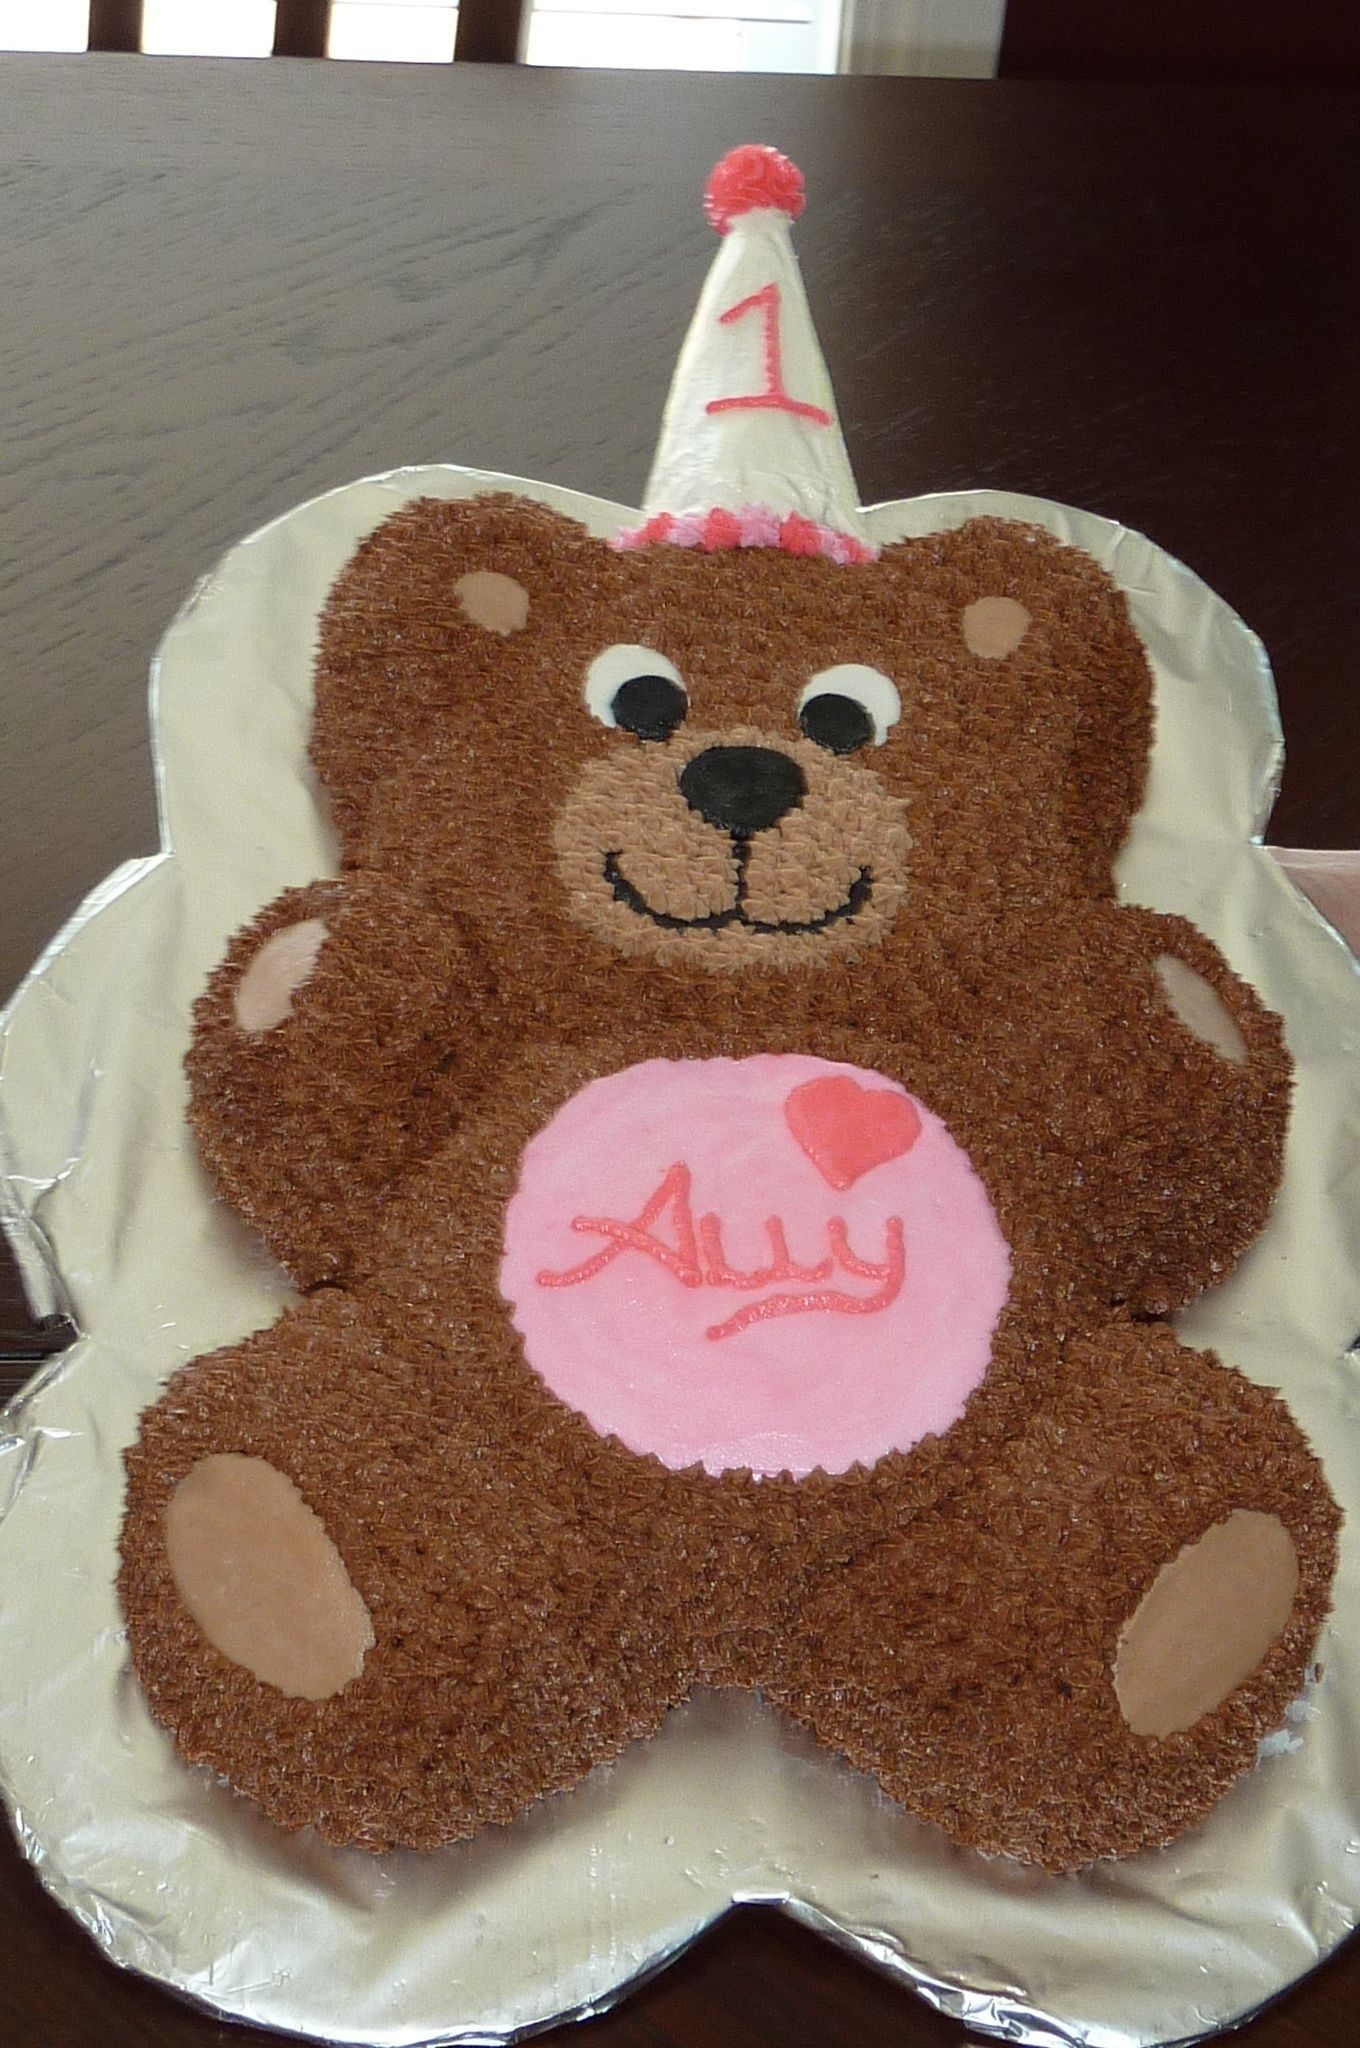 How To Decorate A Teddy Bear Birthday Cake